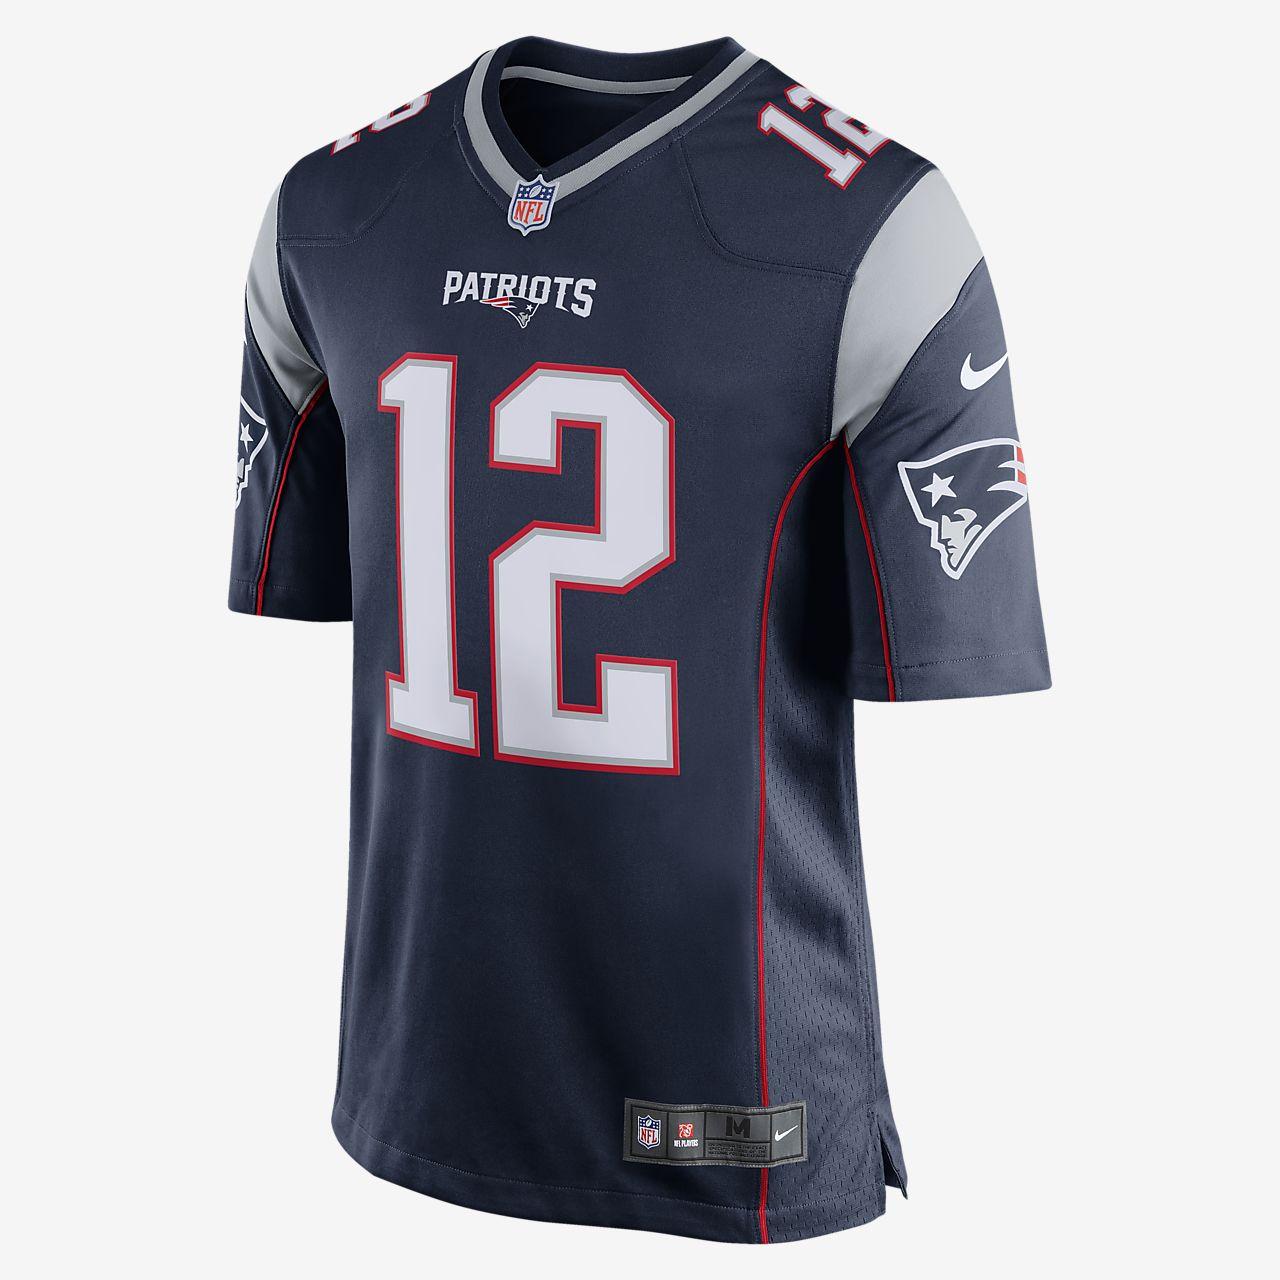 8da744cfb6d NFL New England Patriots (Tom Brady) Men's American Football Home ...